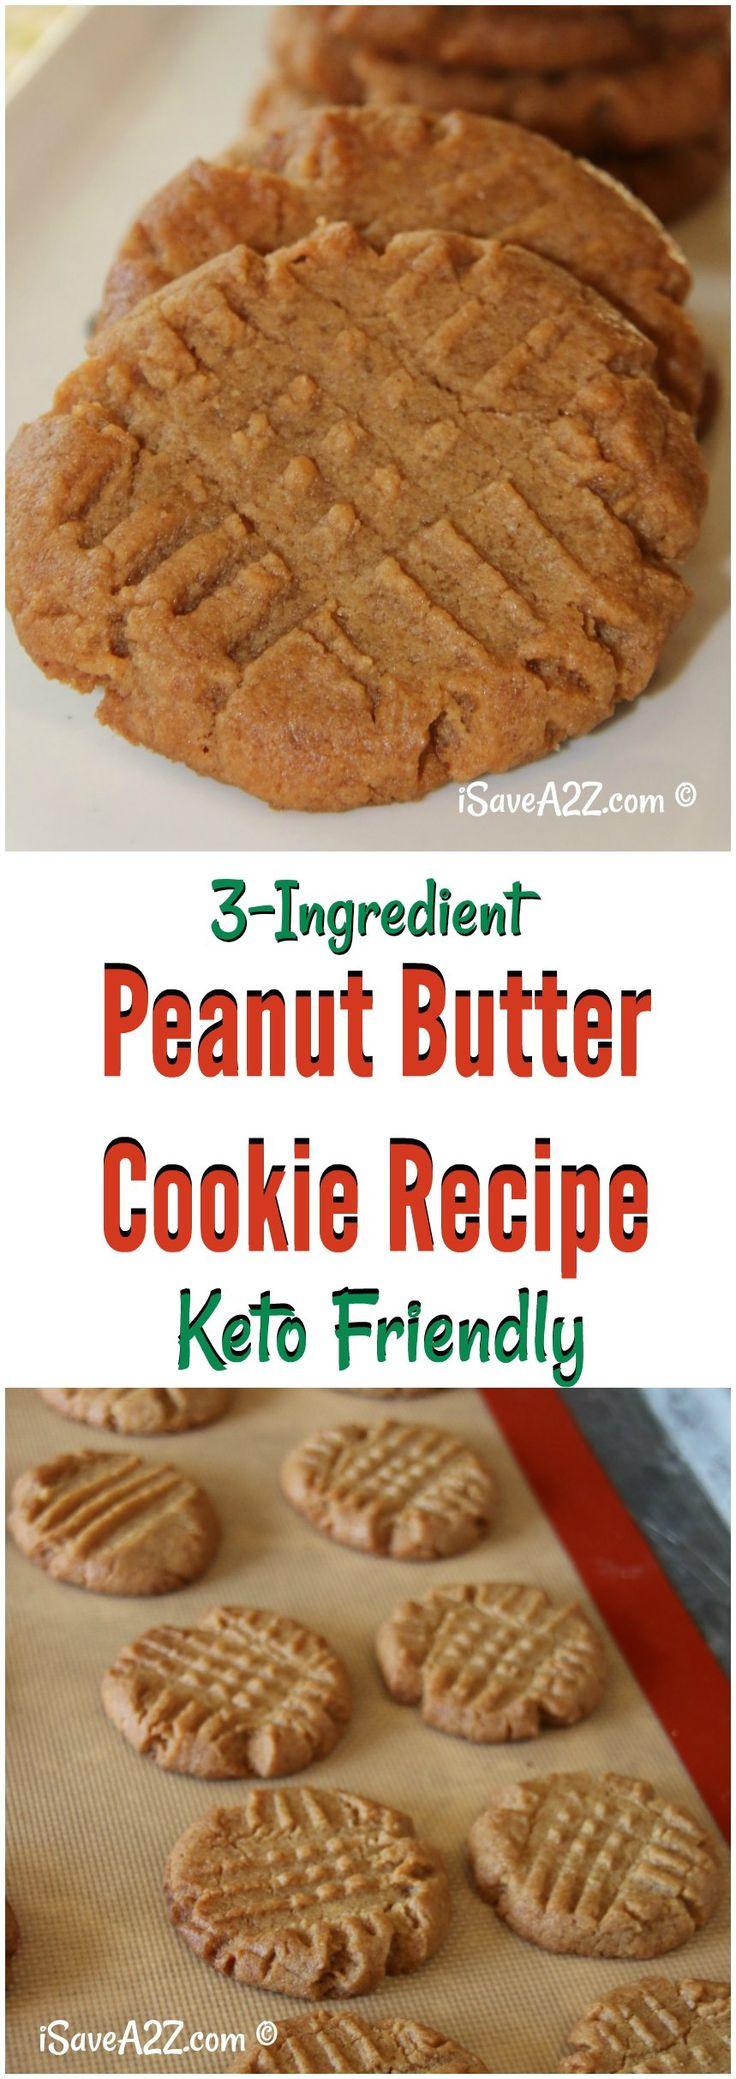 Peanut Butter Keto Diet  The 25 best Ketogenic t ideas on Pinterest